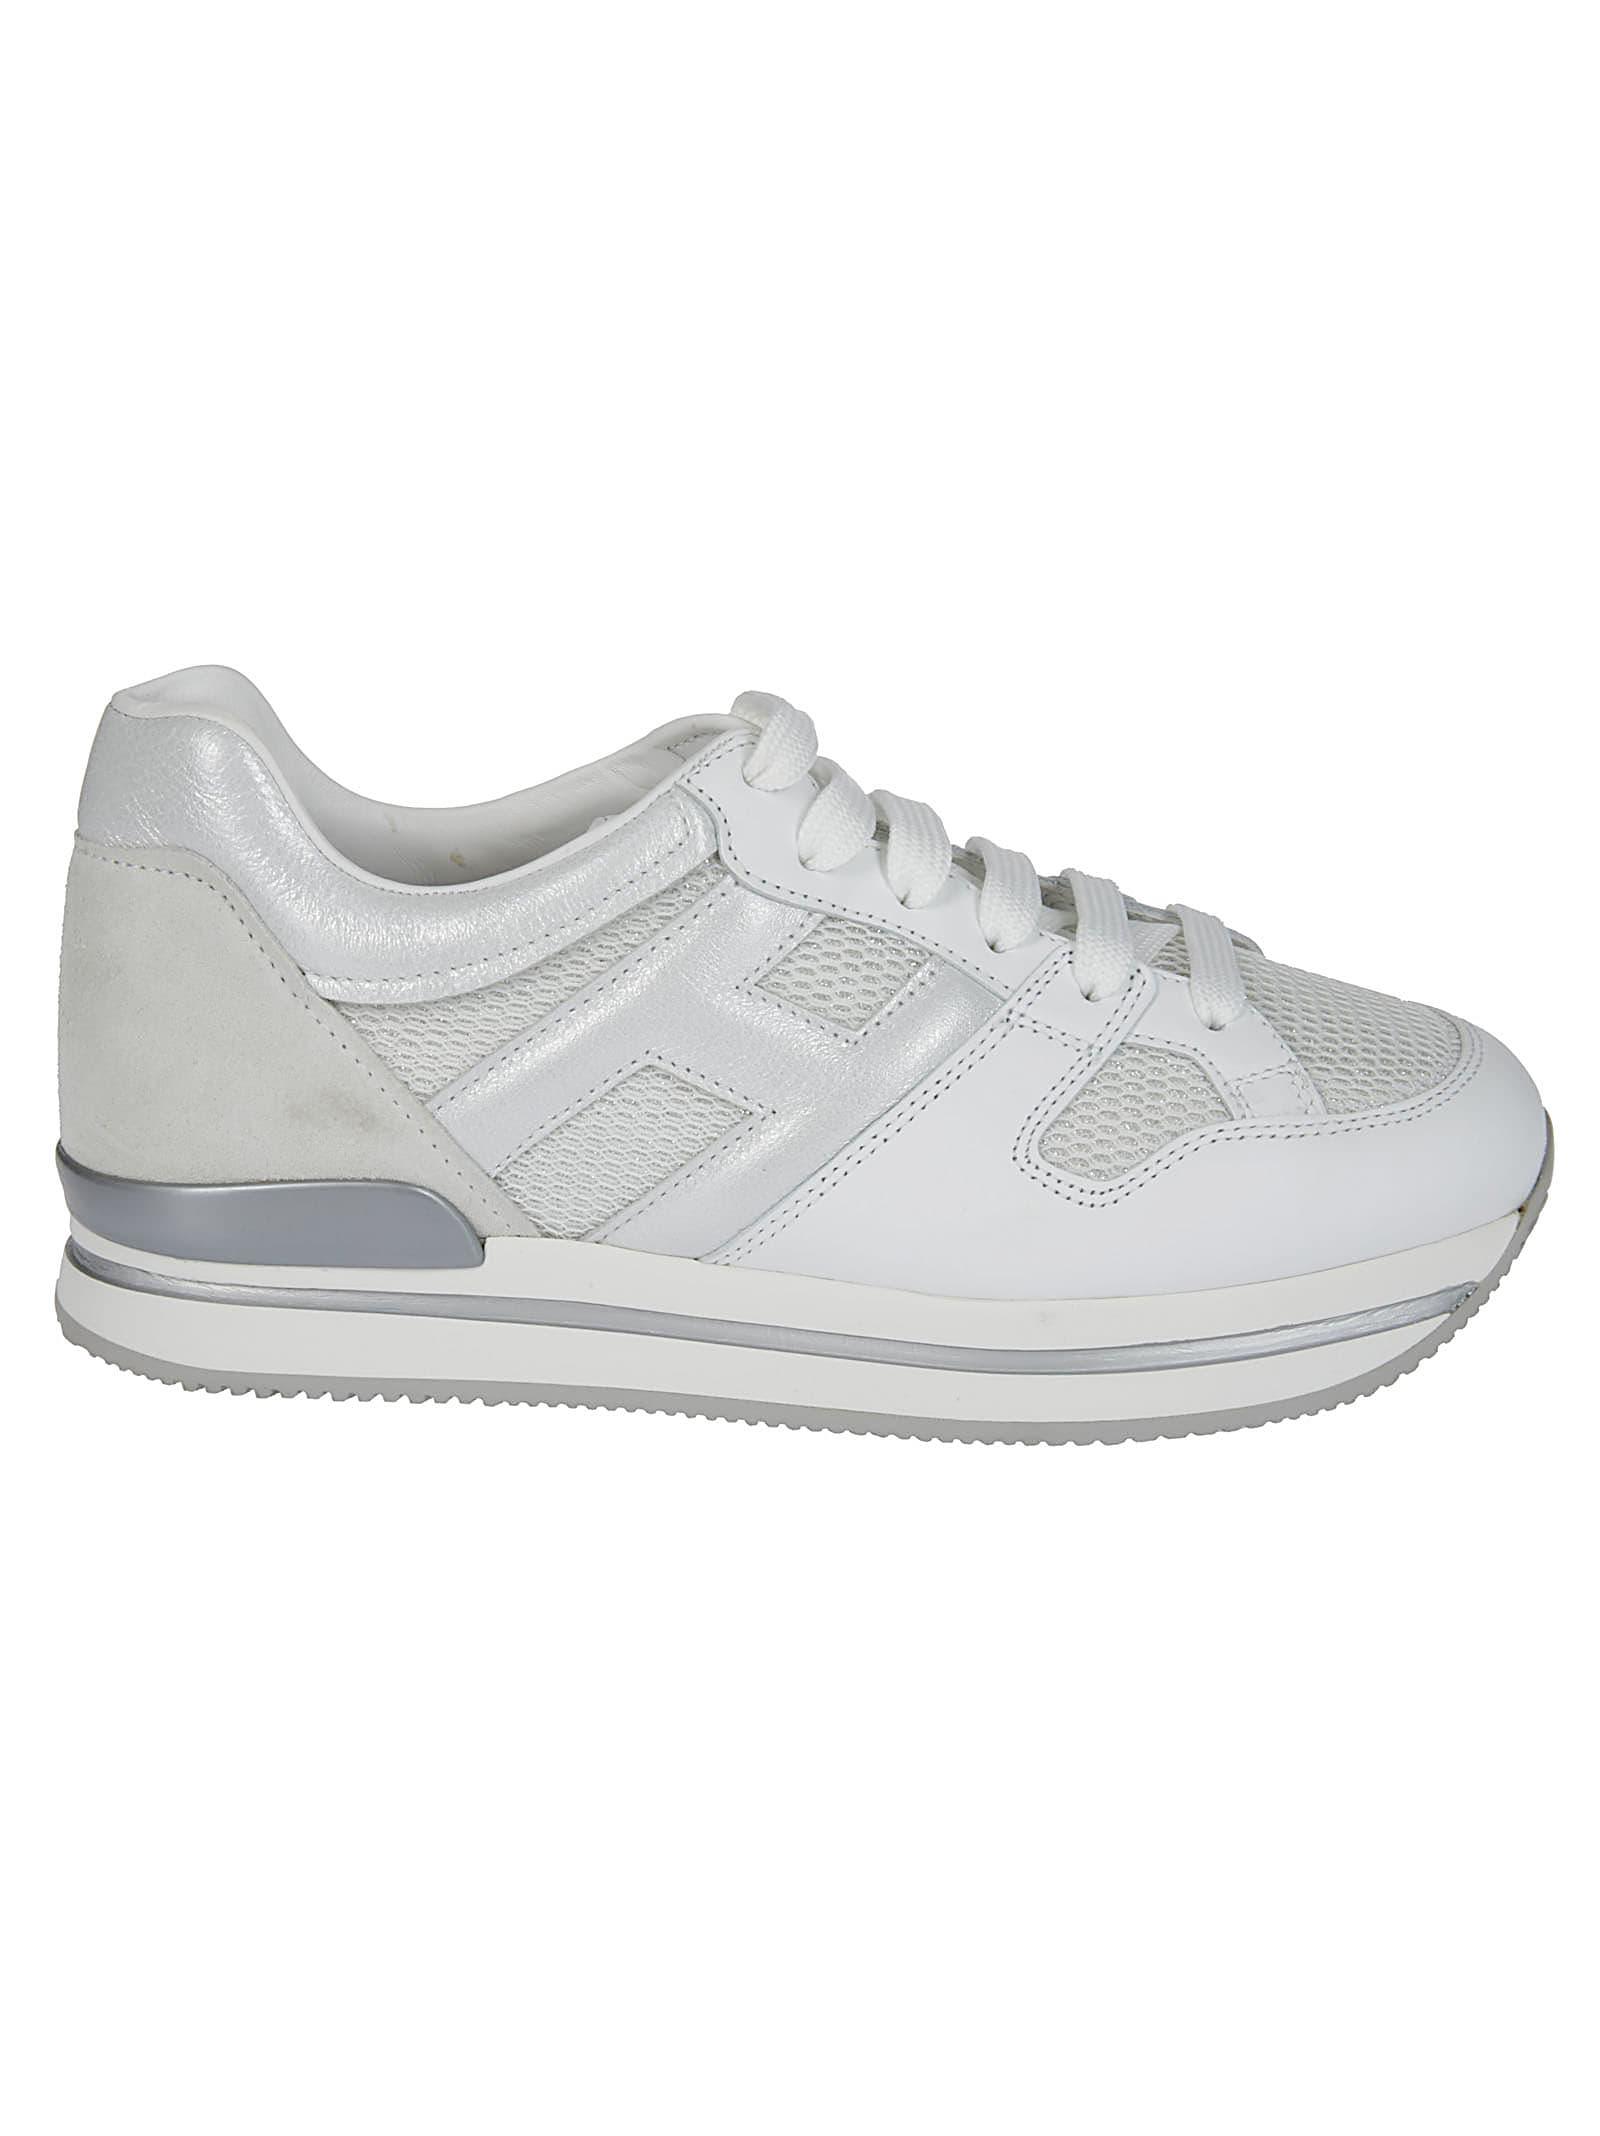 Hogan White Lather Sneakers